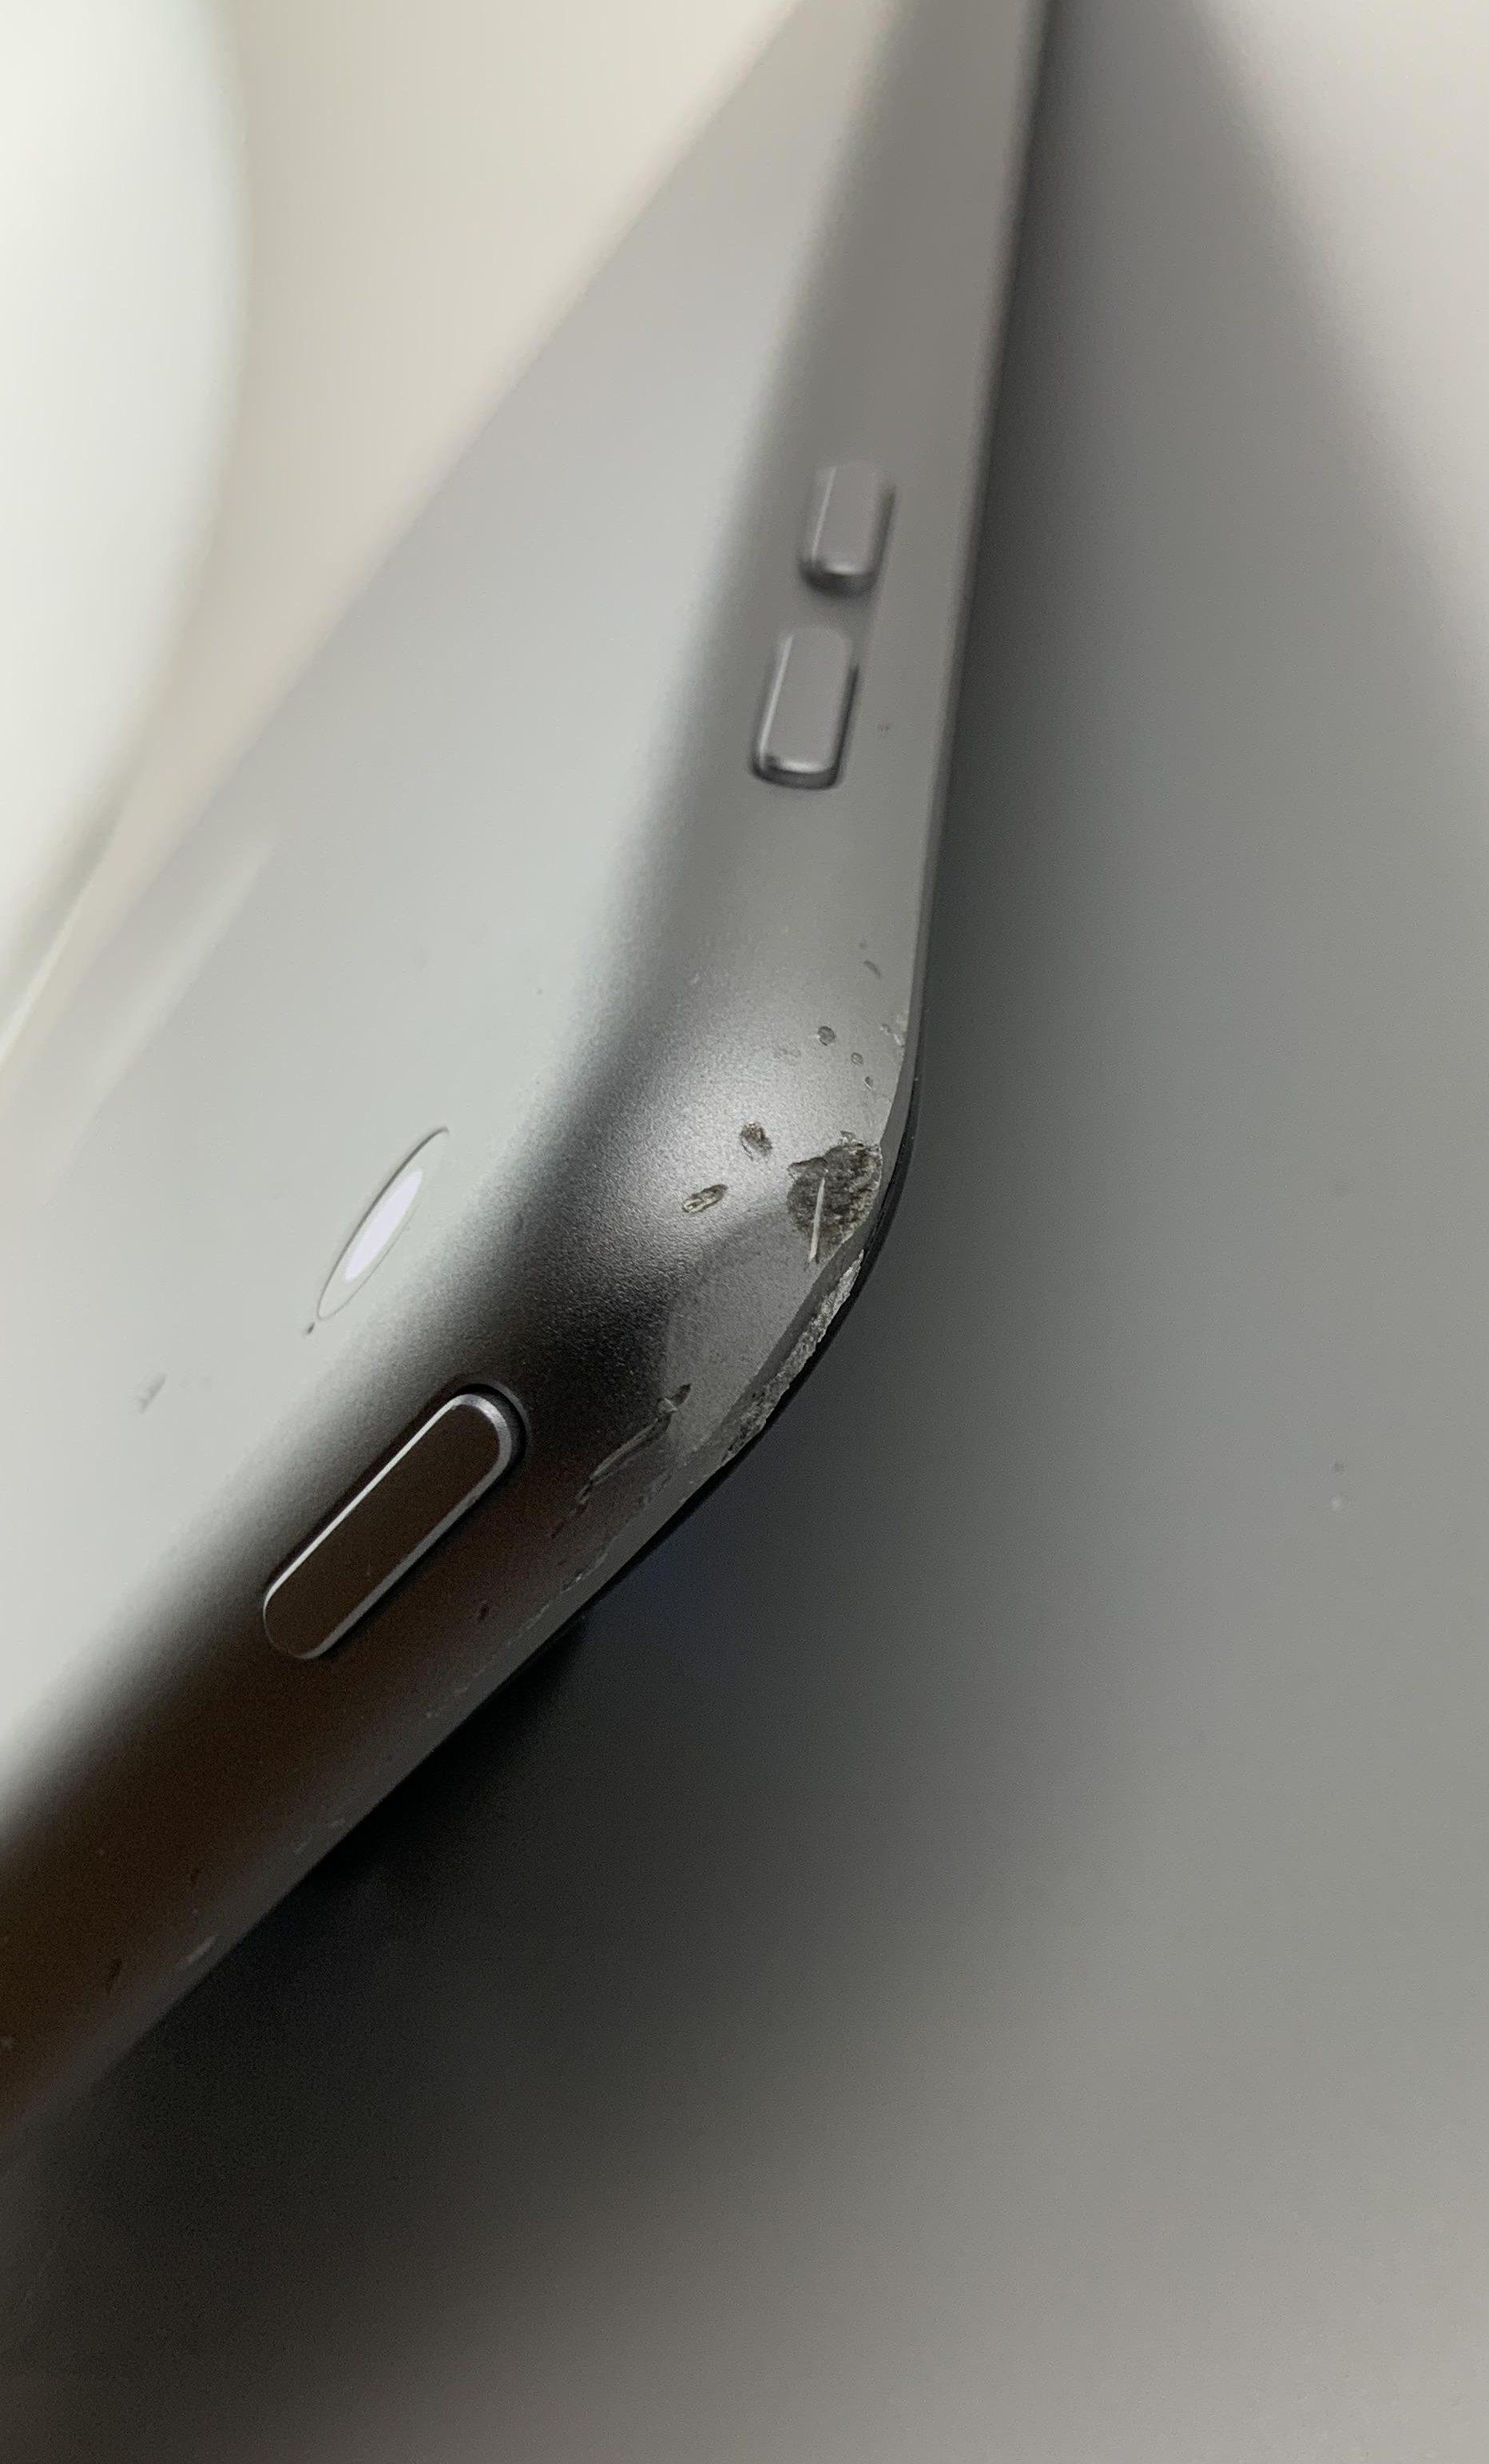 iPad 6 Wi-Fi 32GB, 32GB, Space Gray, Kuva 5